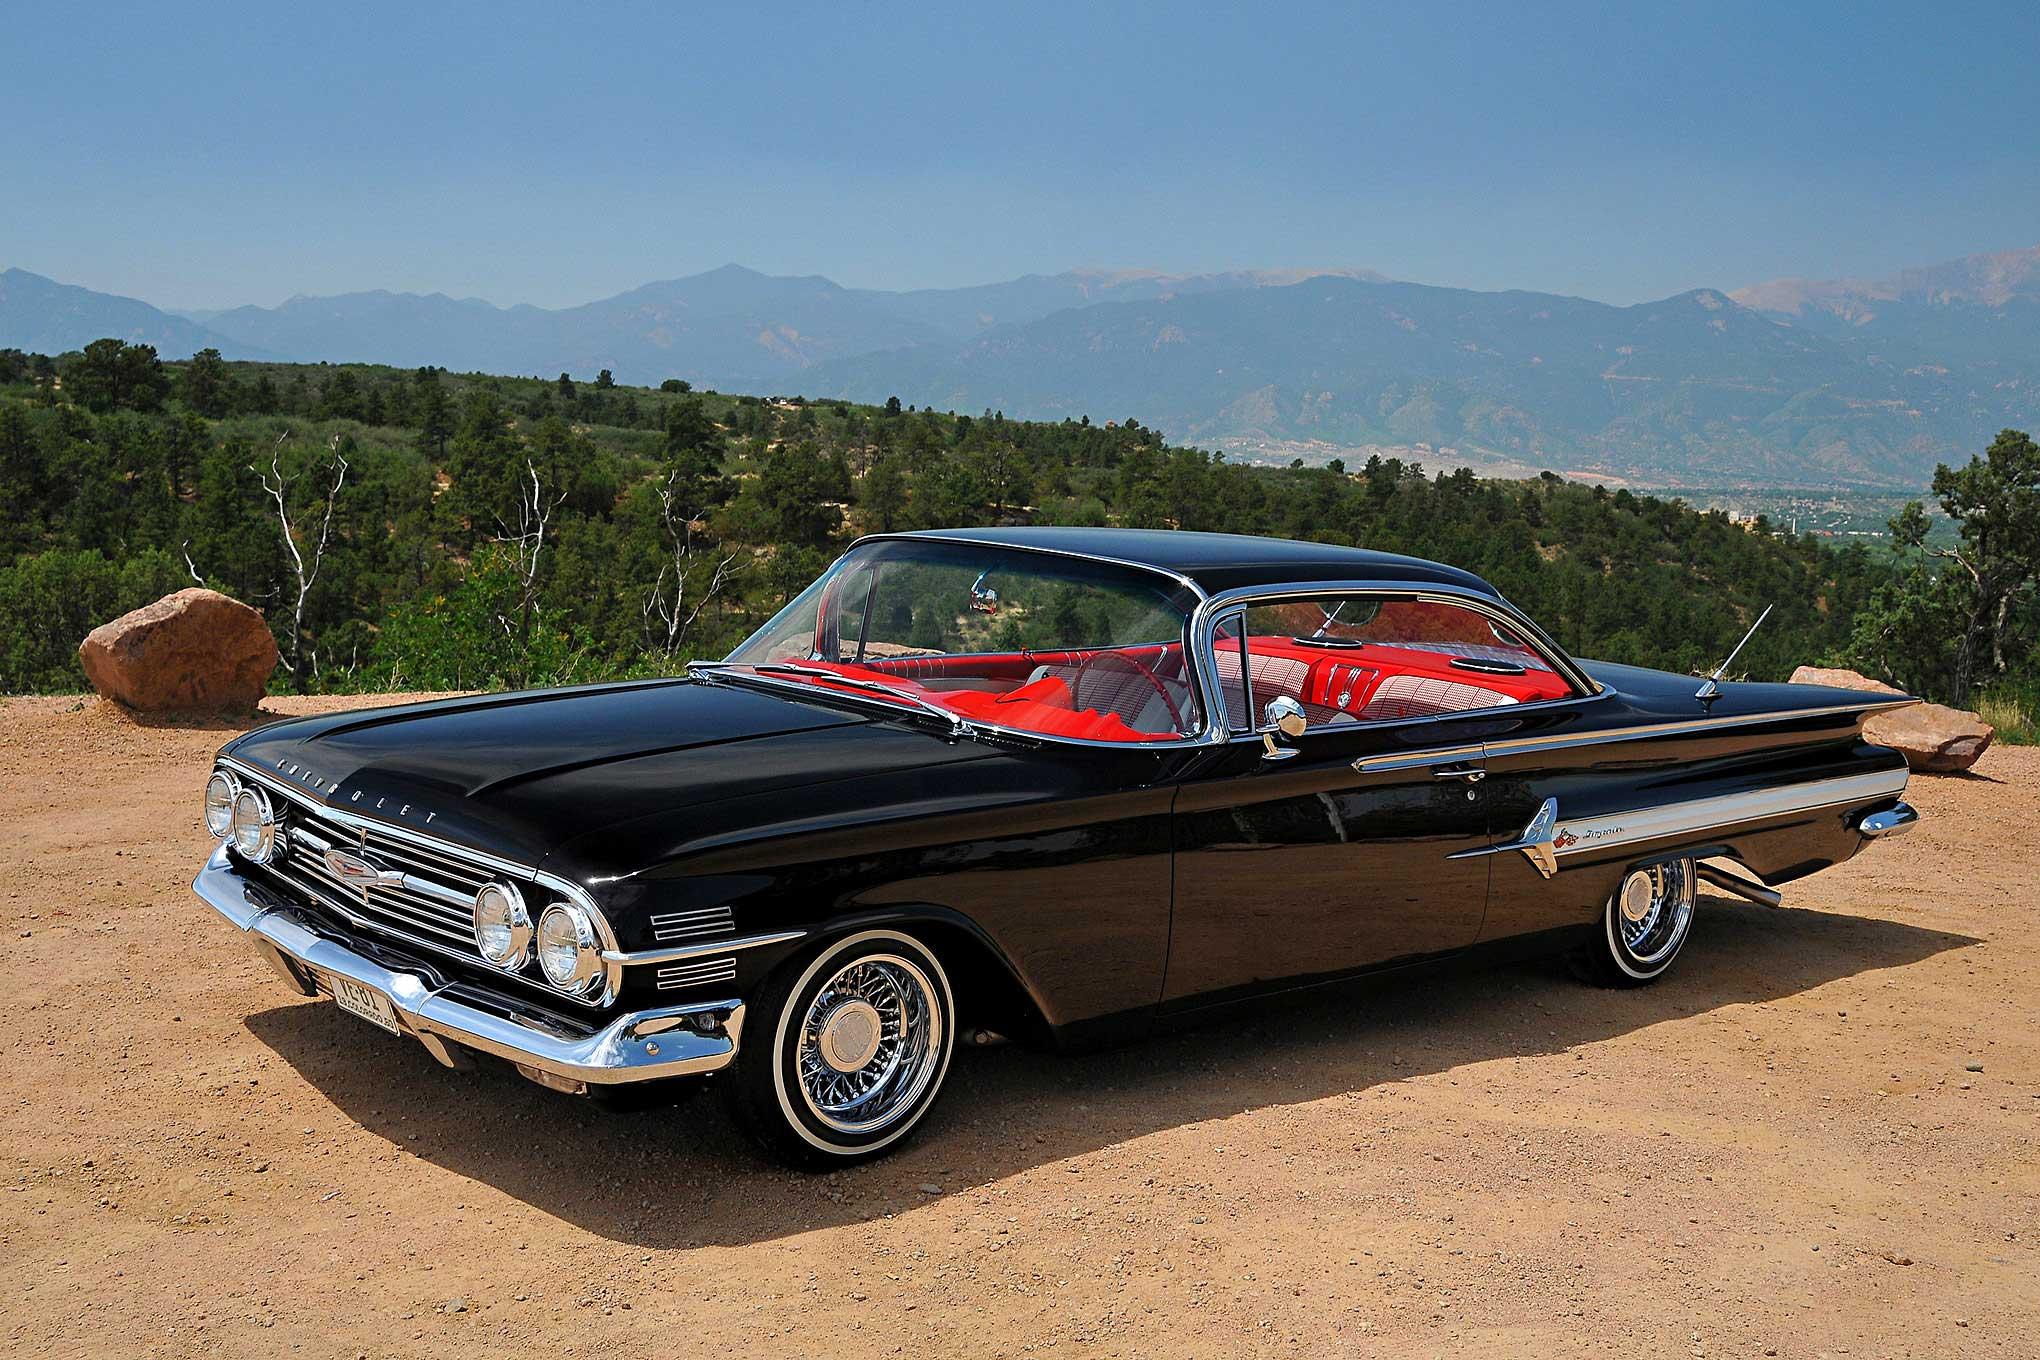 Kelebihan Chevrolet Impala 1960 Harga